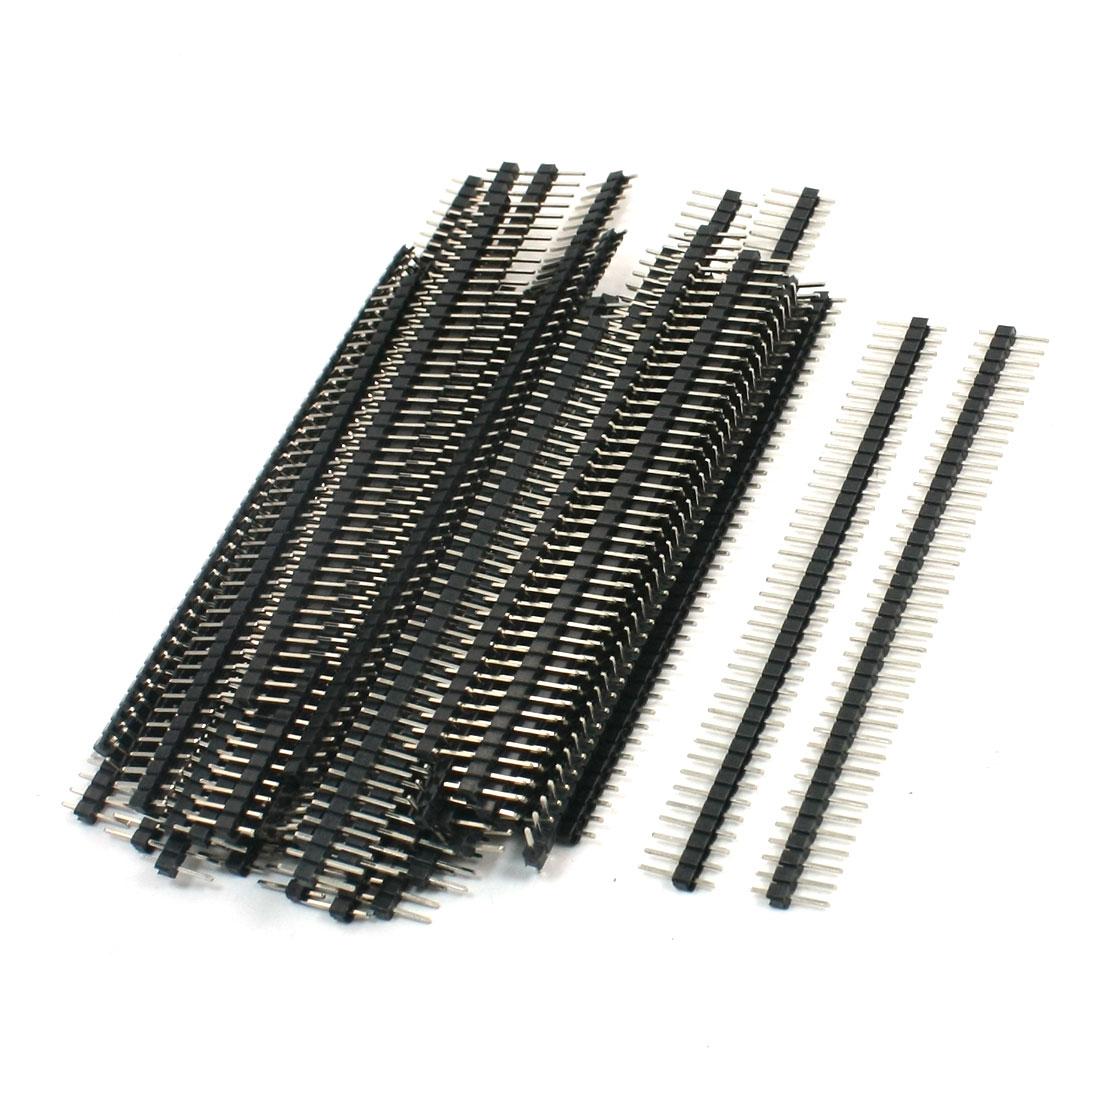 50Pcs Black 40 Pin 2.54mm Single Row Straight Male Pin Header Strip